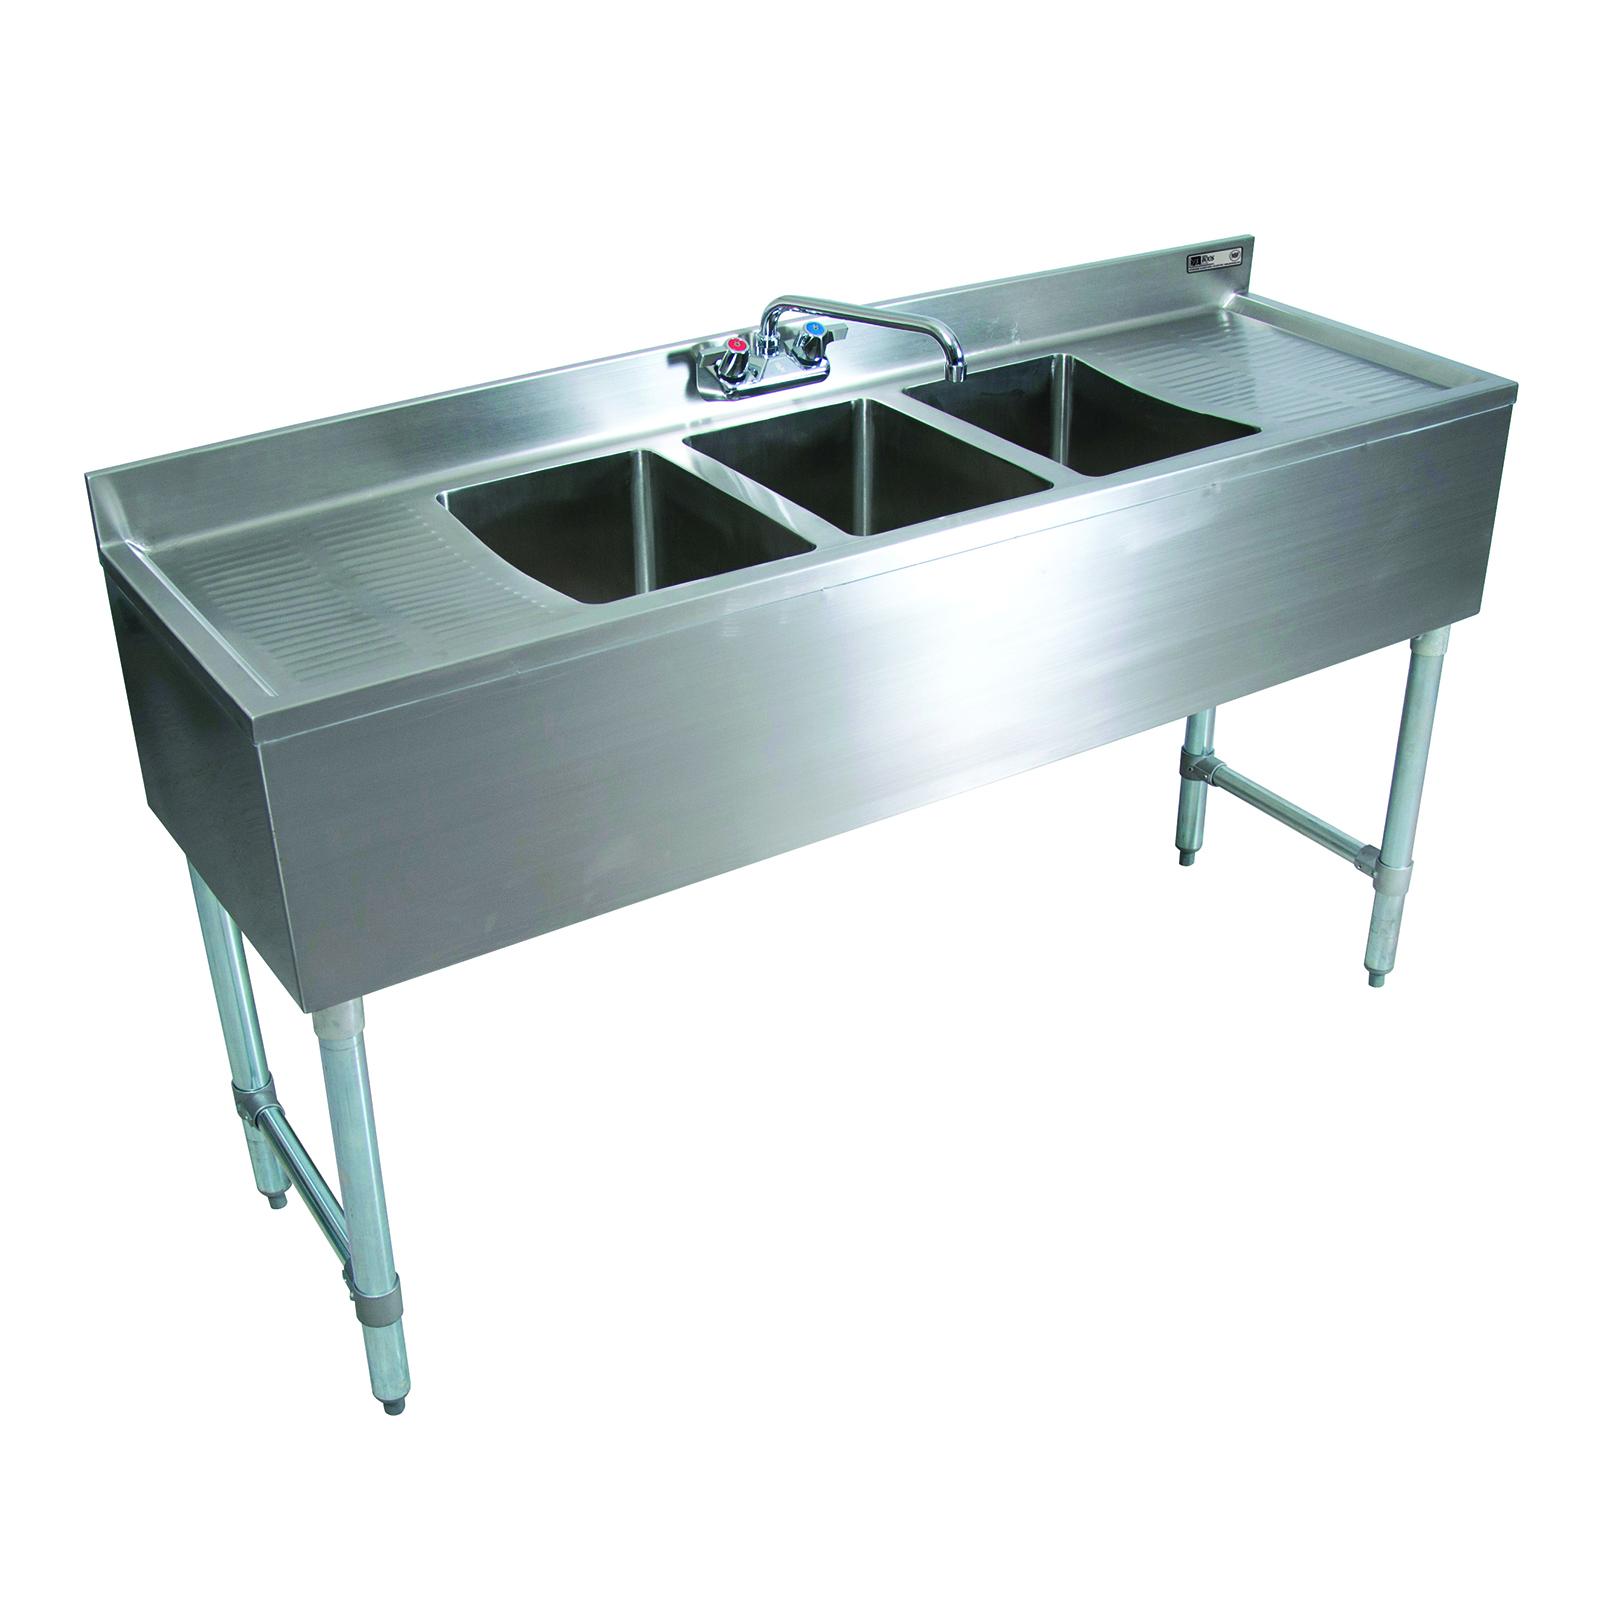 John Boos EUB3S48SL-1LD underbar sink units